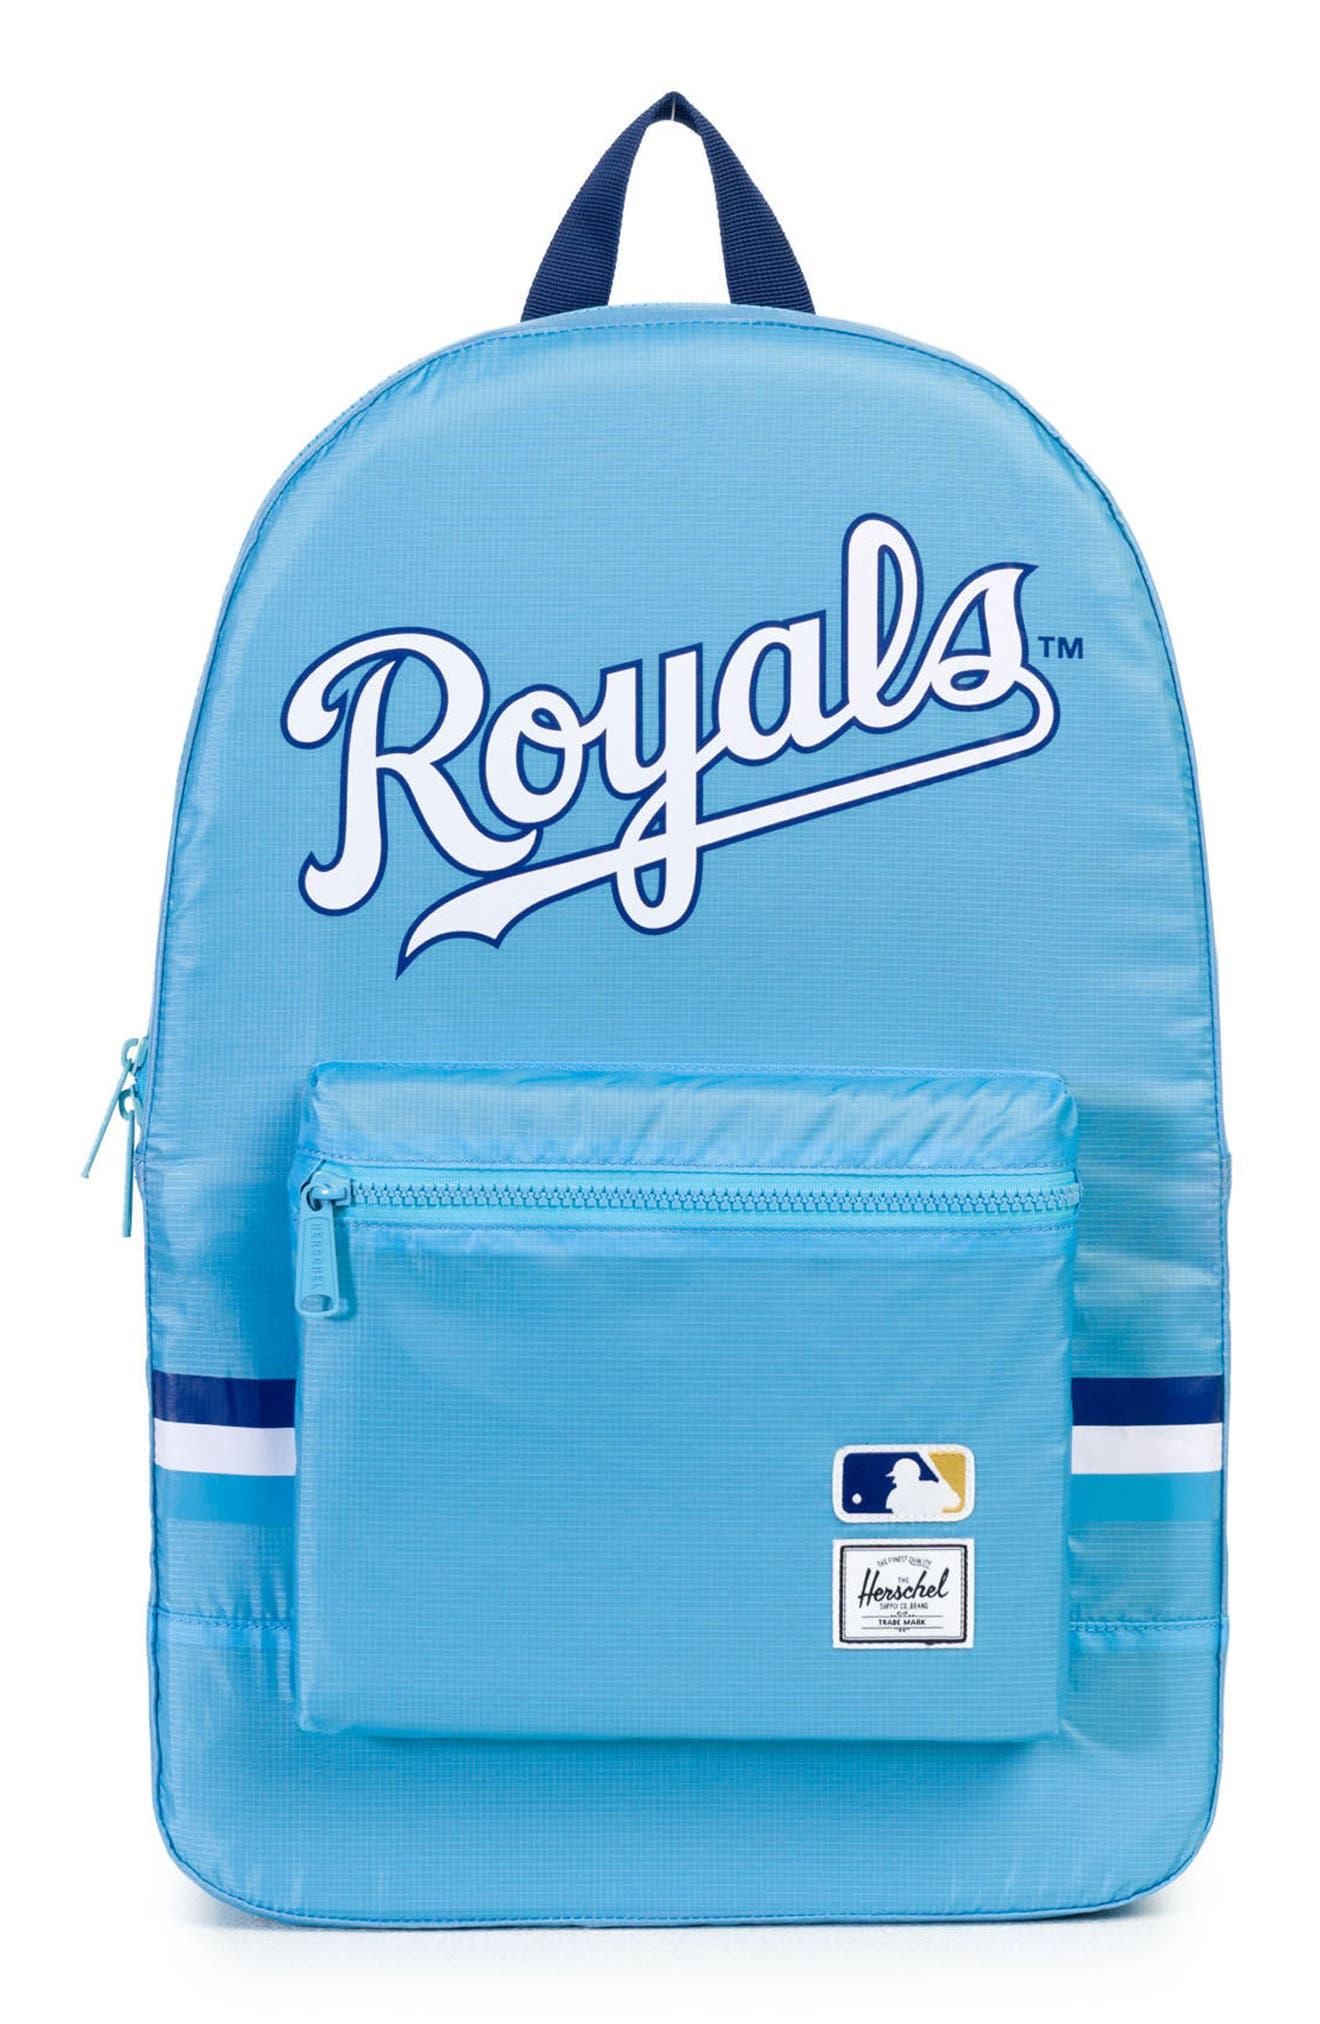 Packable - MLB American League Backpack,                             Main thumbnail 1, color,                             Kansas City Royals